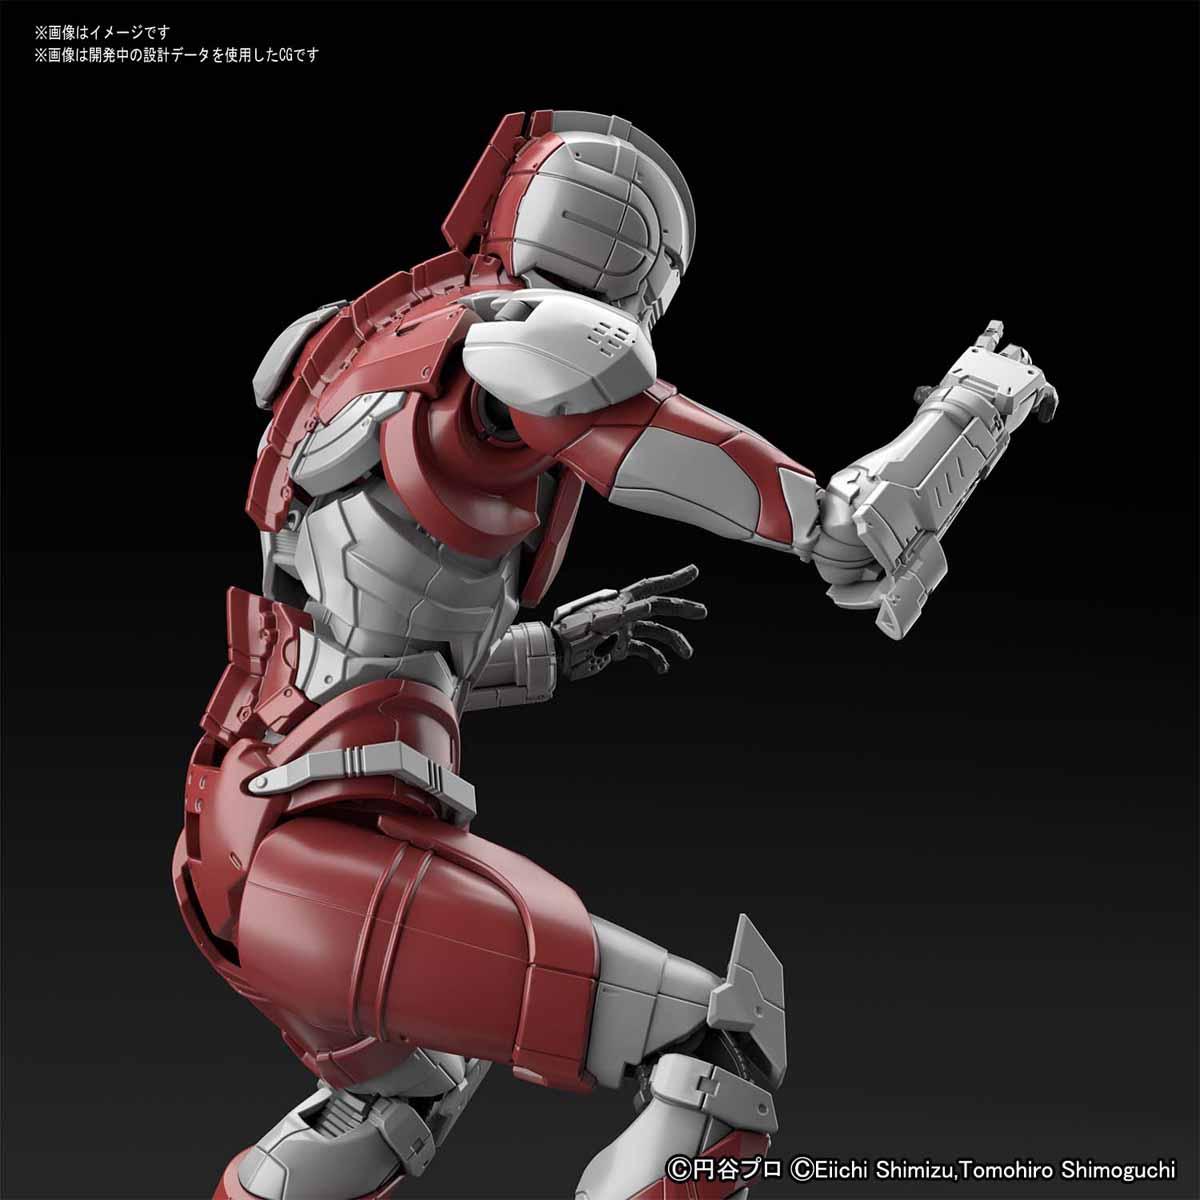 Figure-rise Standard『ULTRAMAN [B TYPE] -ACTION-』ウルトラマンスーツ 1/12 プラモデル-004